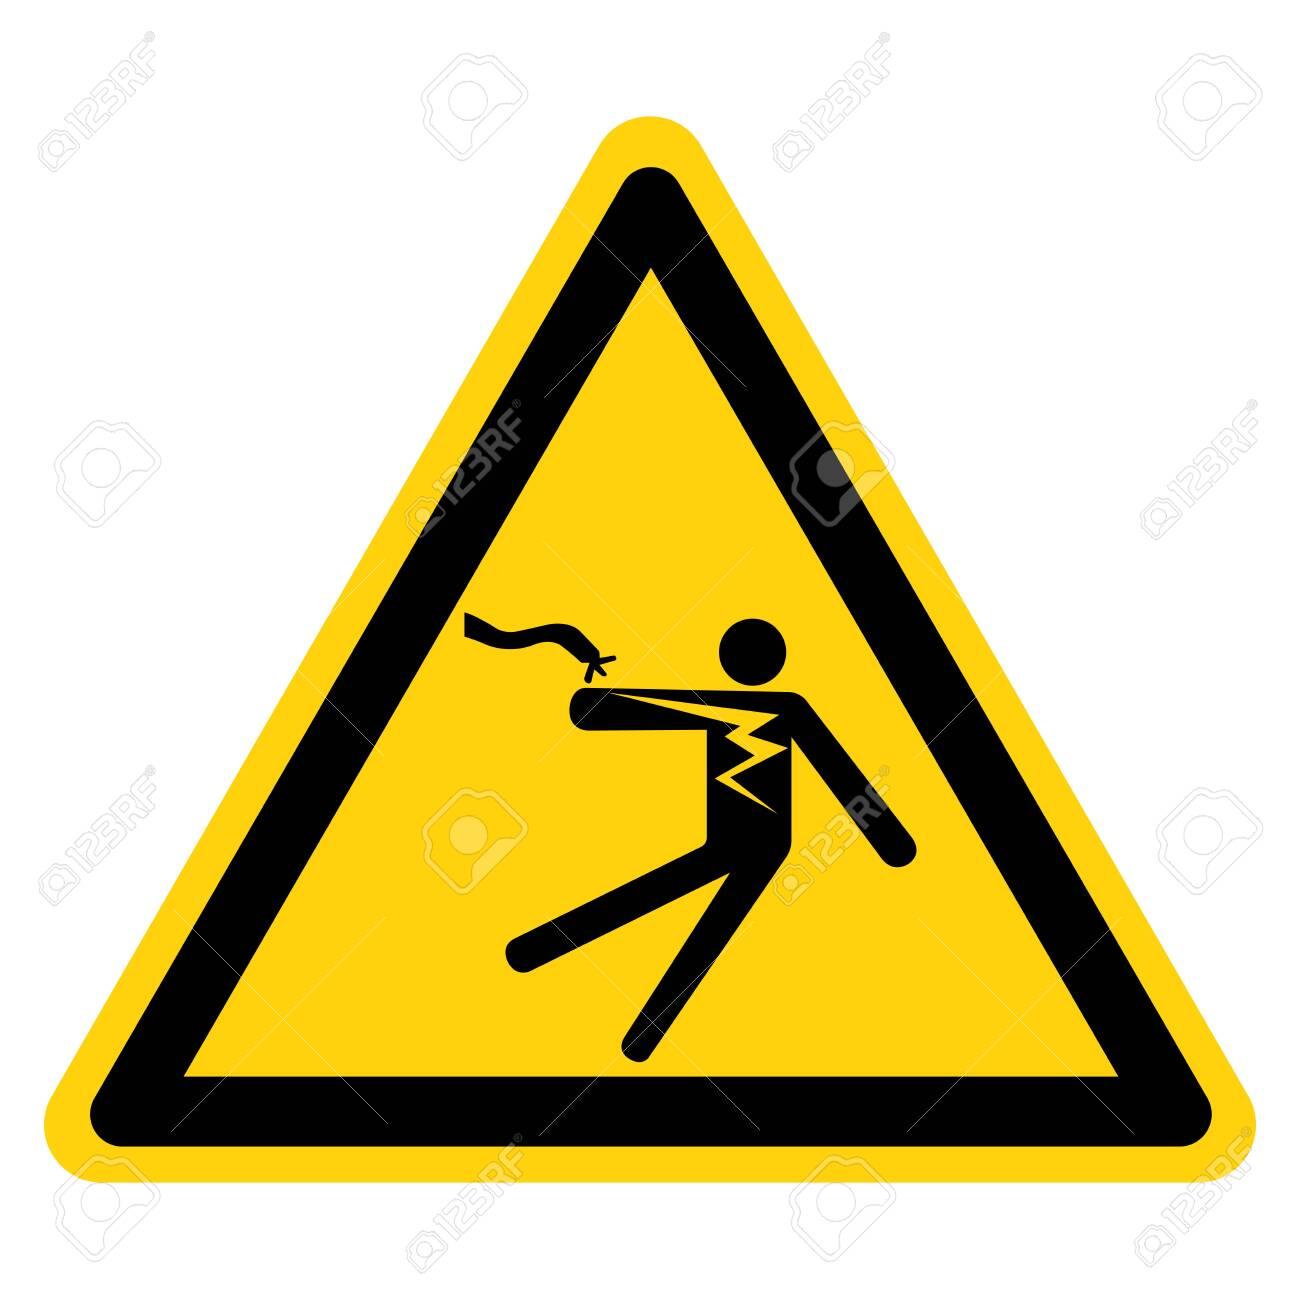 Electrical Shock Electrocution Symbol Sign, Vector Illustration, Isolate On White Background Label .EPS10 - 122254491